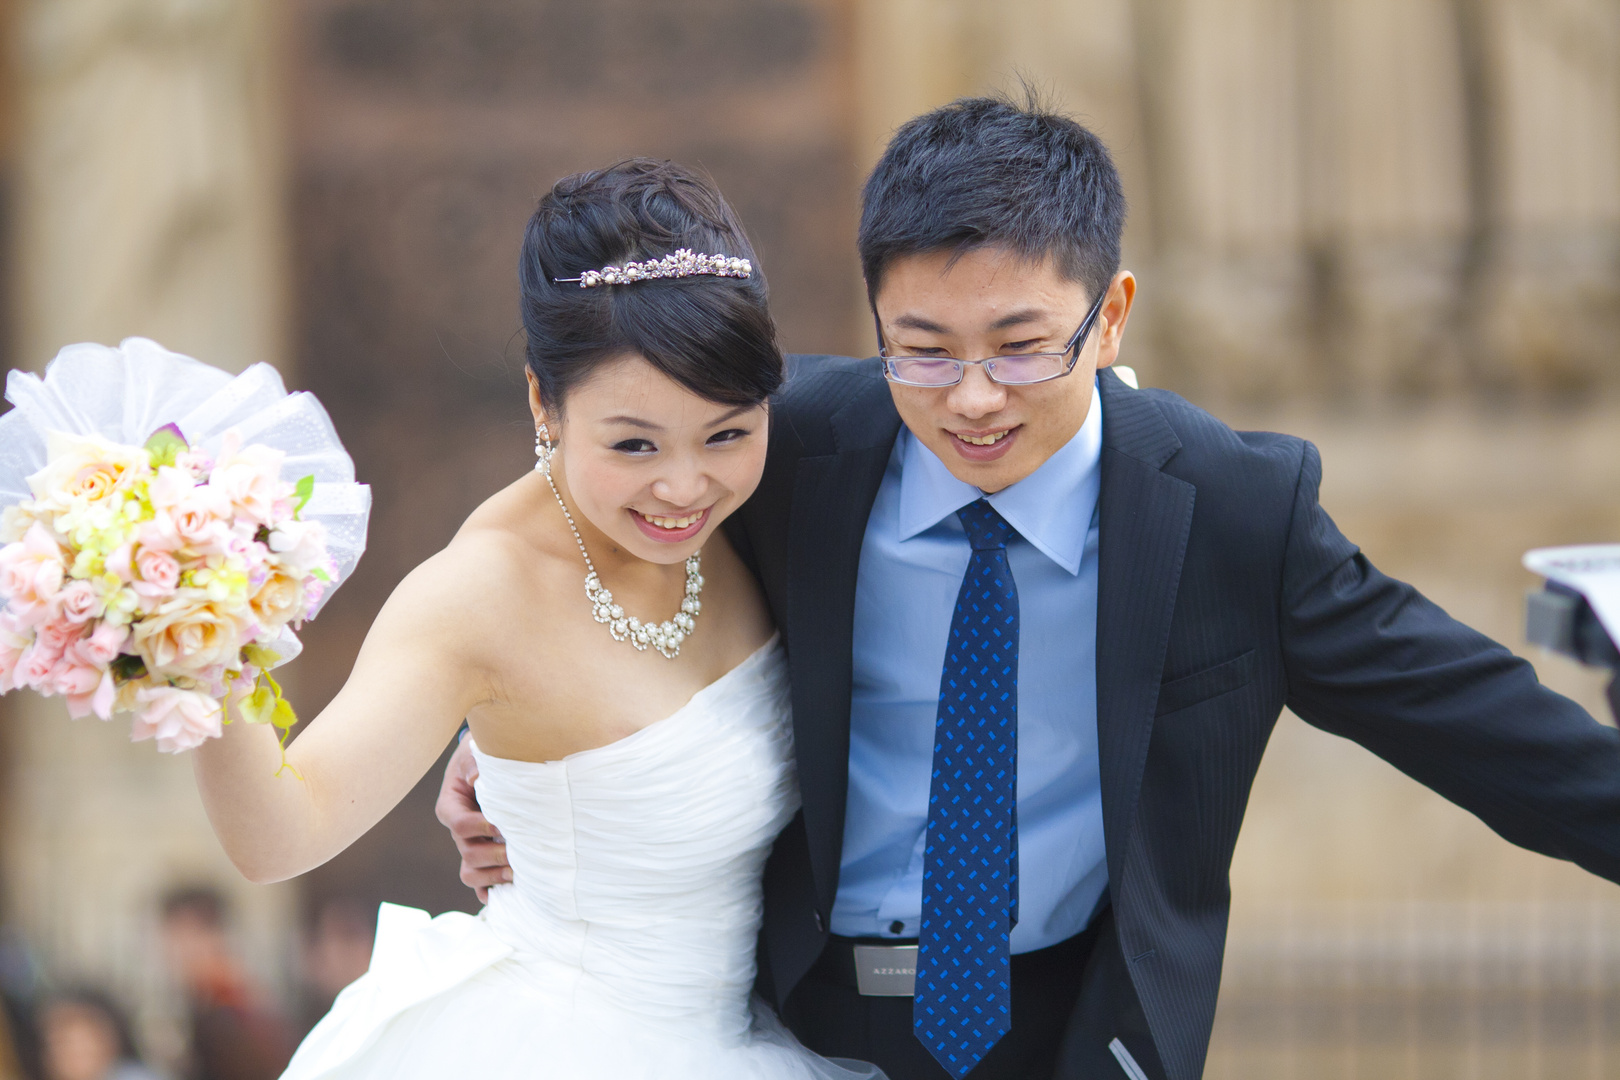 Heiraten vor dem Notre Dame